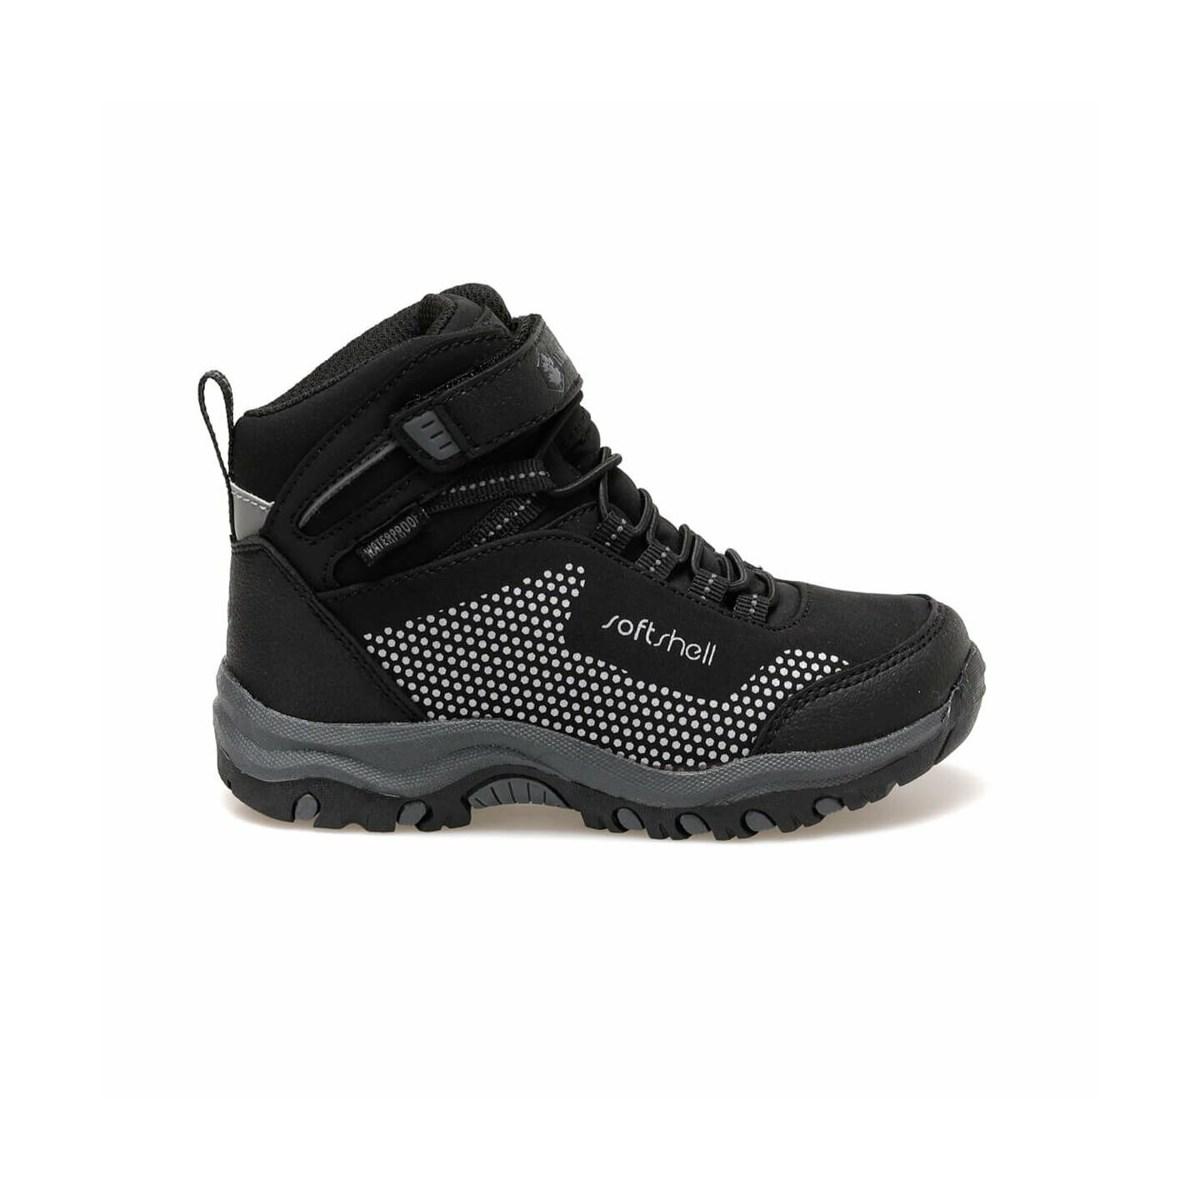 Fuller Çocuk Siyah Outdoor Ayakkabı (100432255)